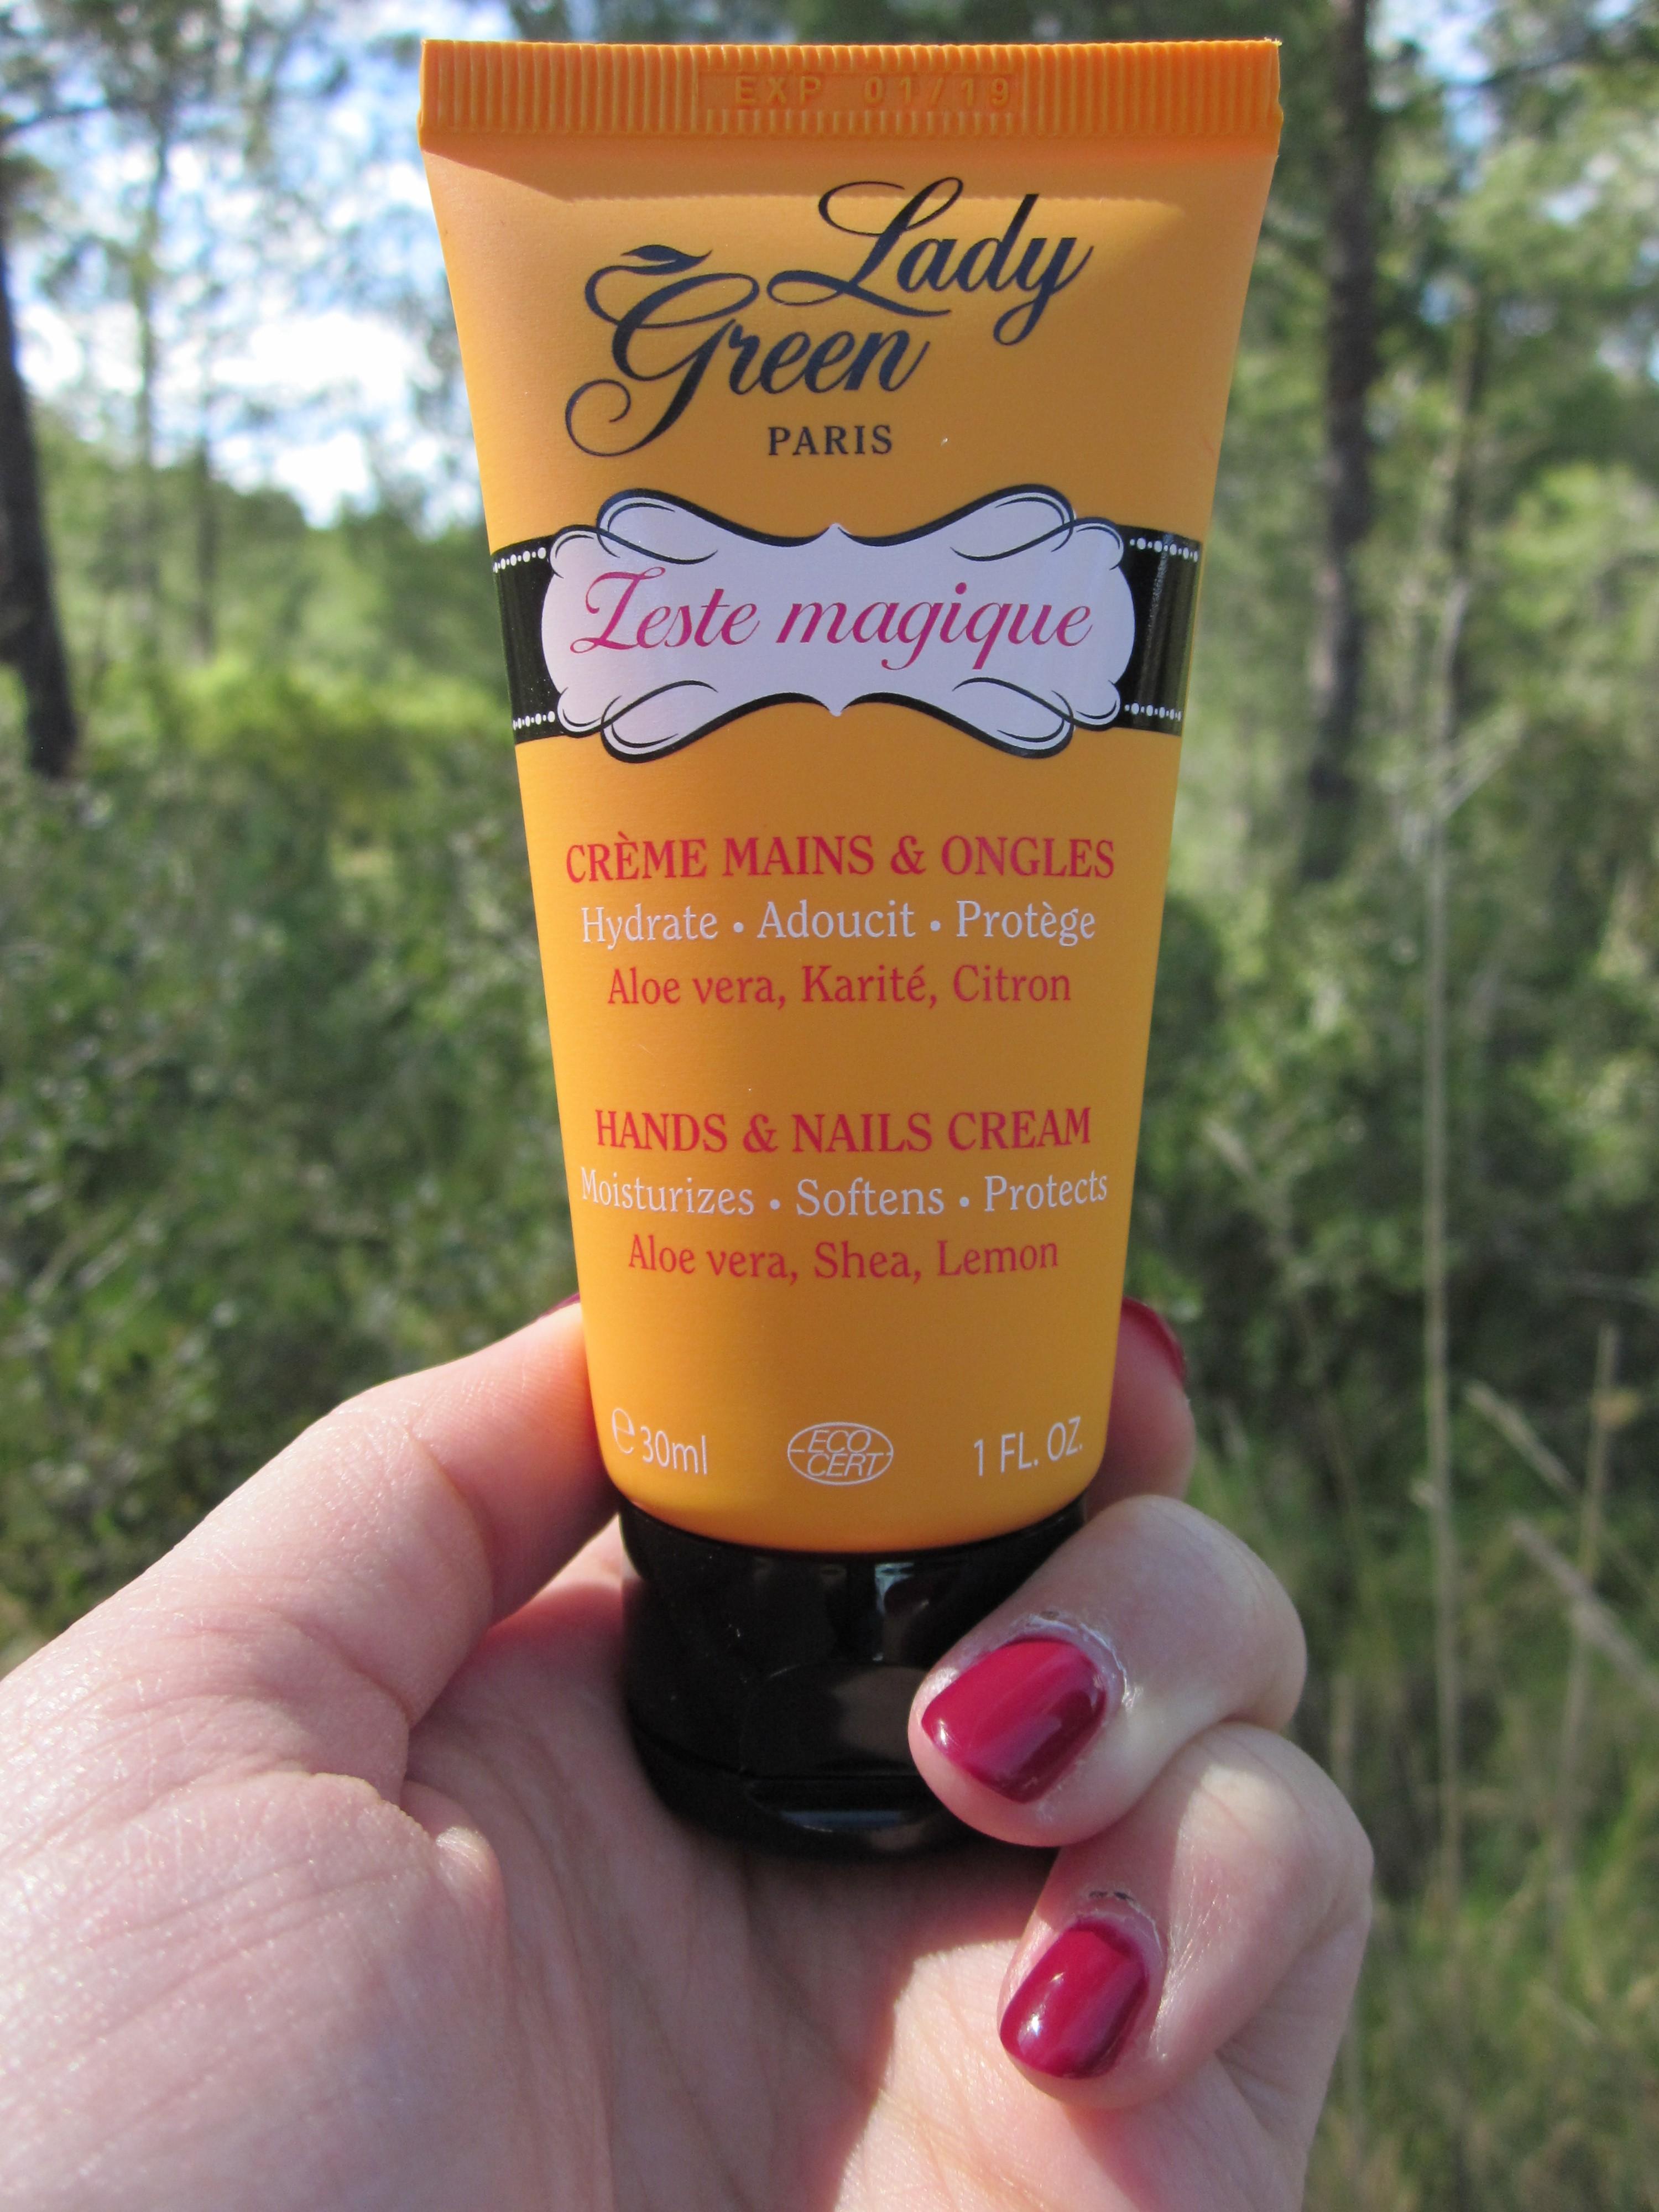 ladygreen-testemagique-creme-mains